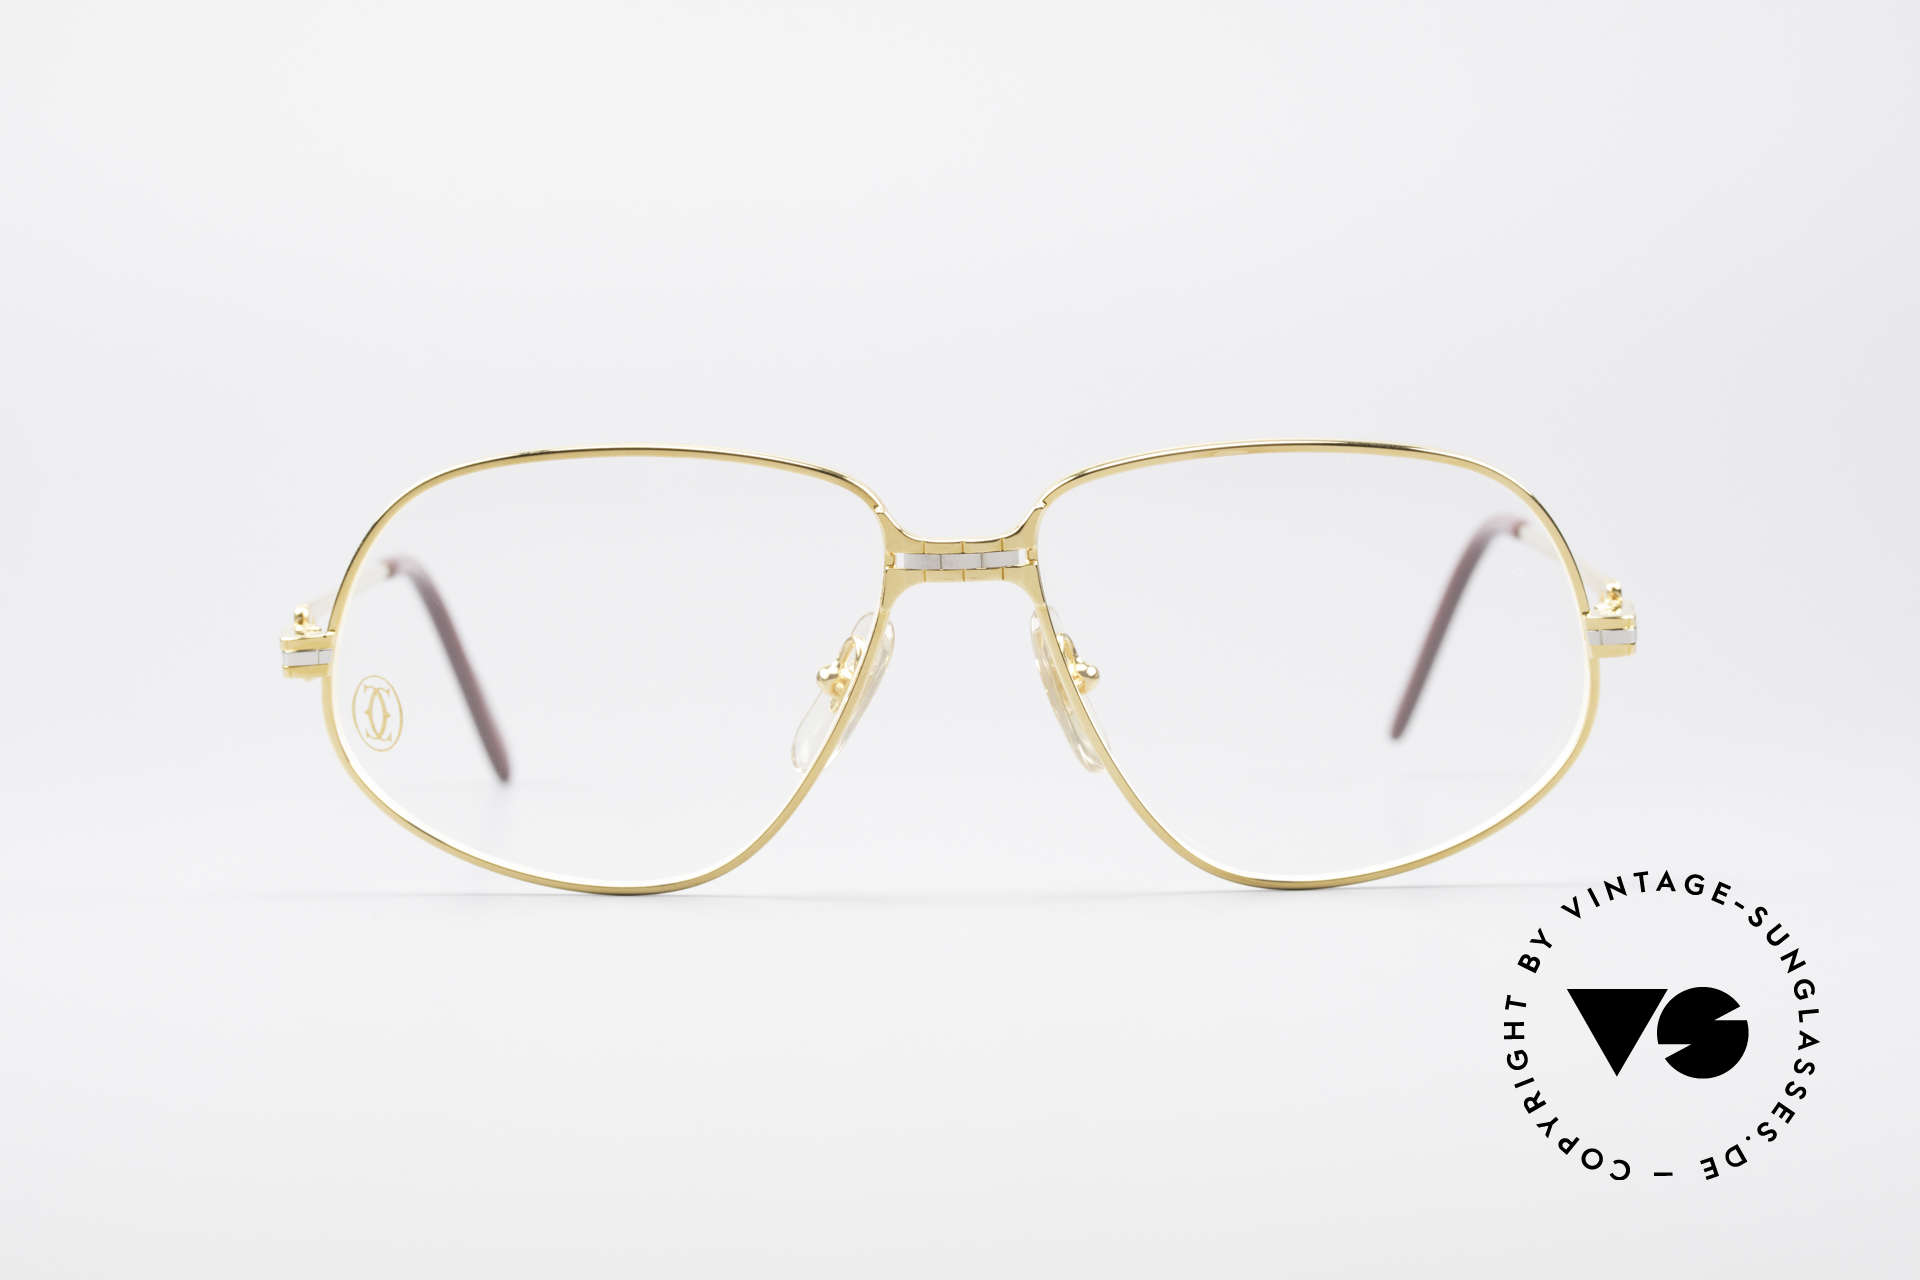 Cartier Panthere G.M. - M 80's Luxury Vintage Eyeglasses, G.M. stands for 'grande modèle' for monsieur / gentleman, Made for Men